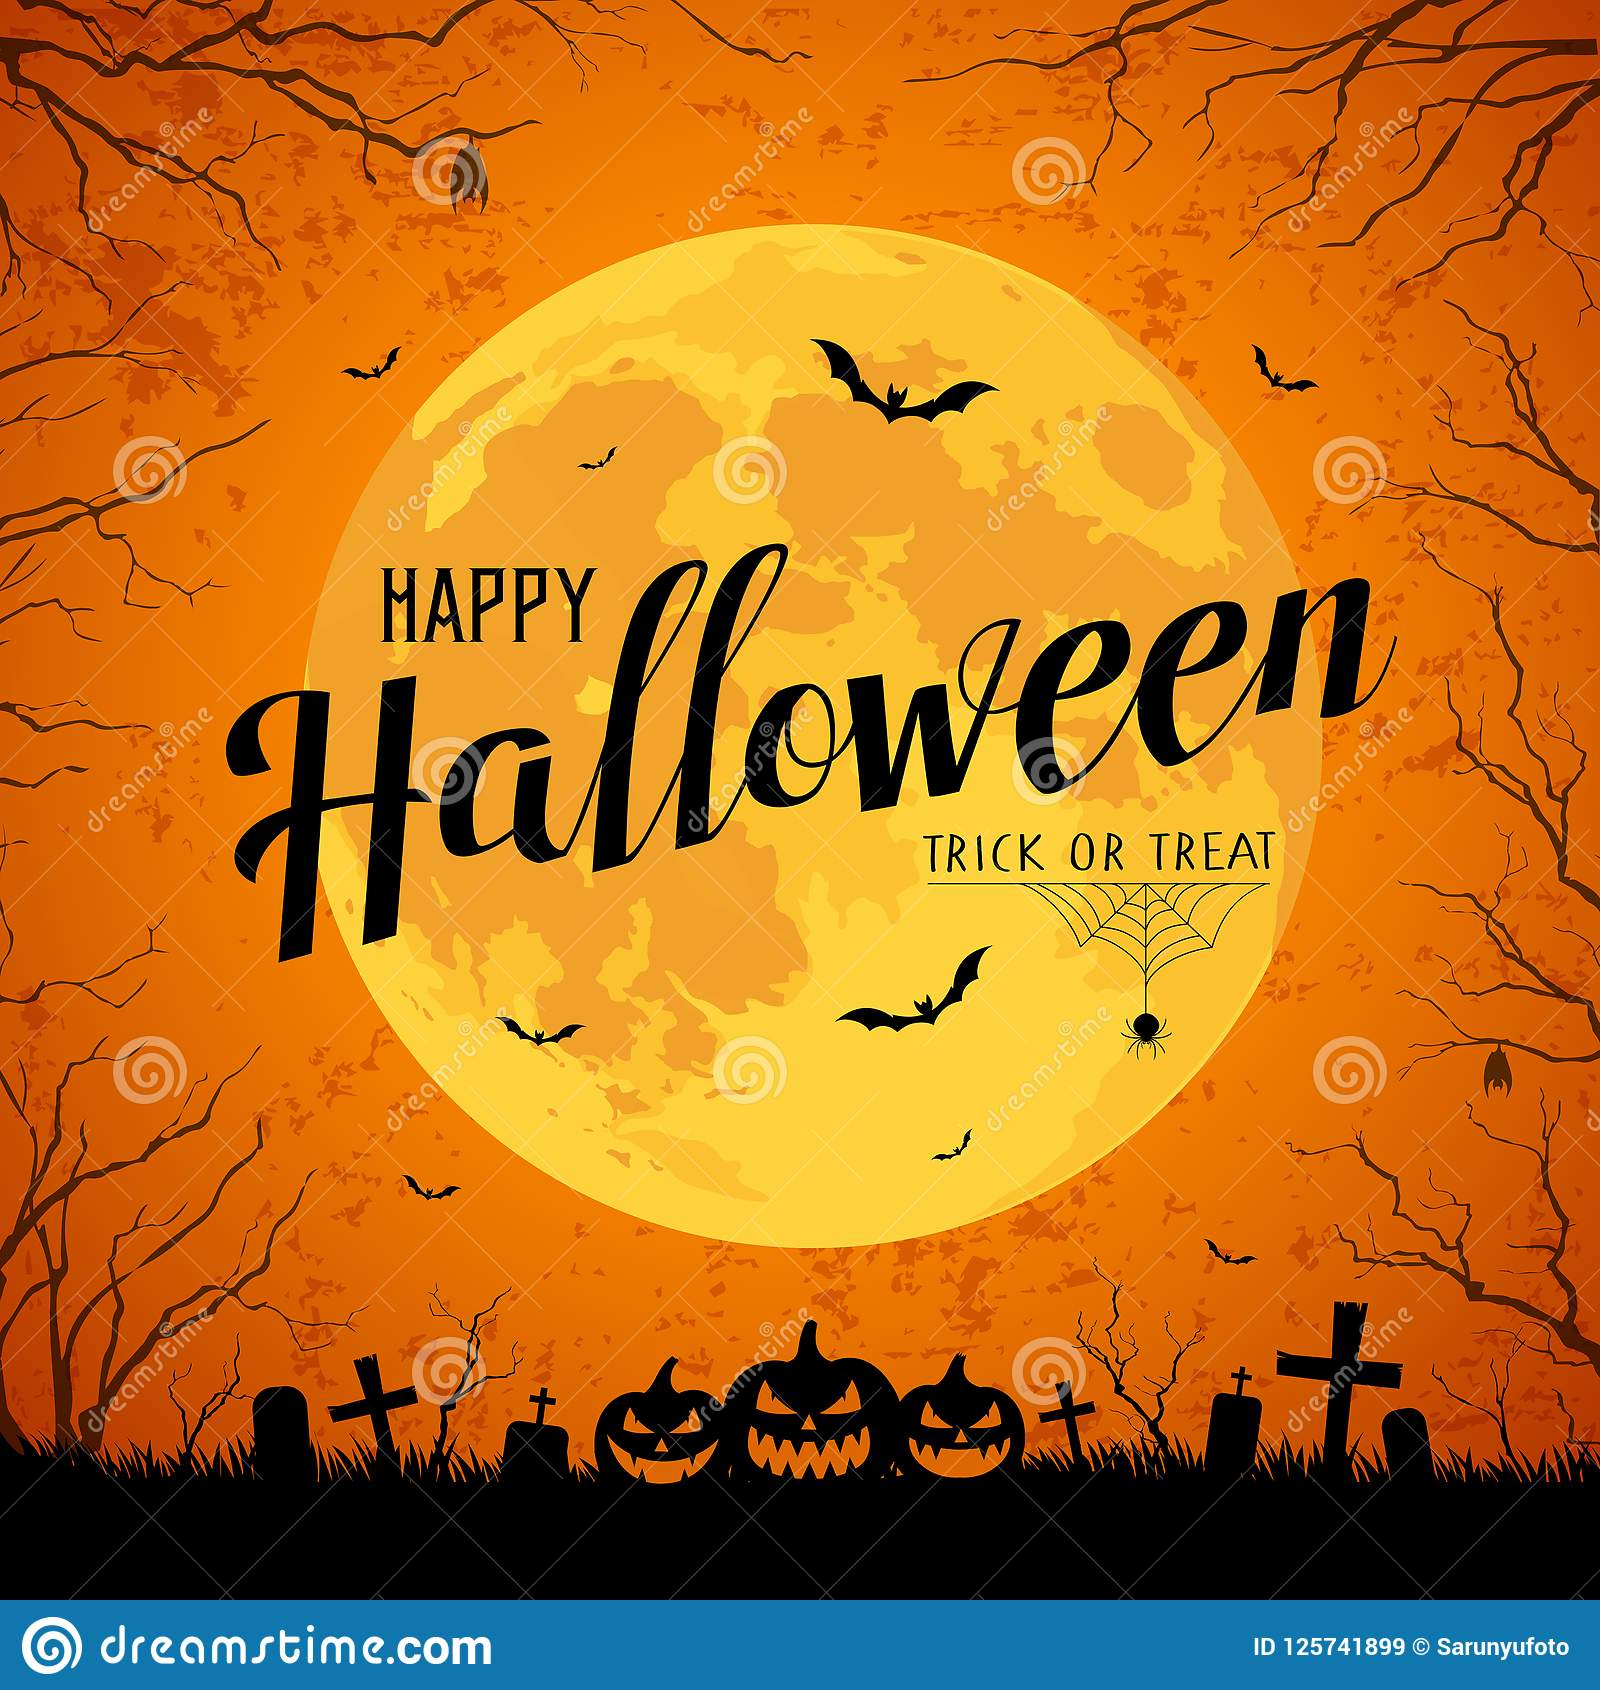 happy halloween message yellow full moon and bat on tree stock